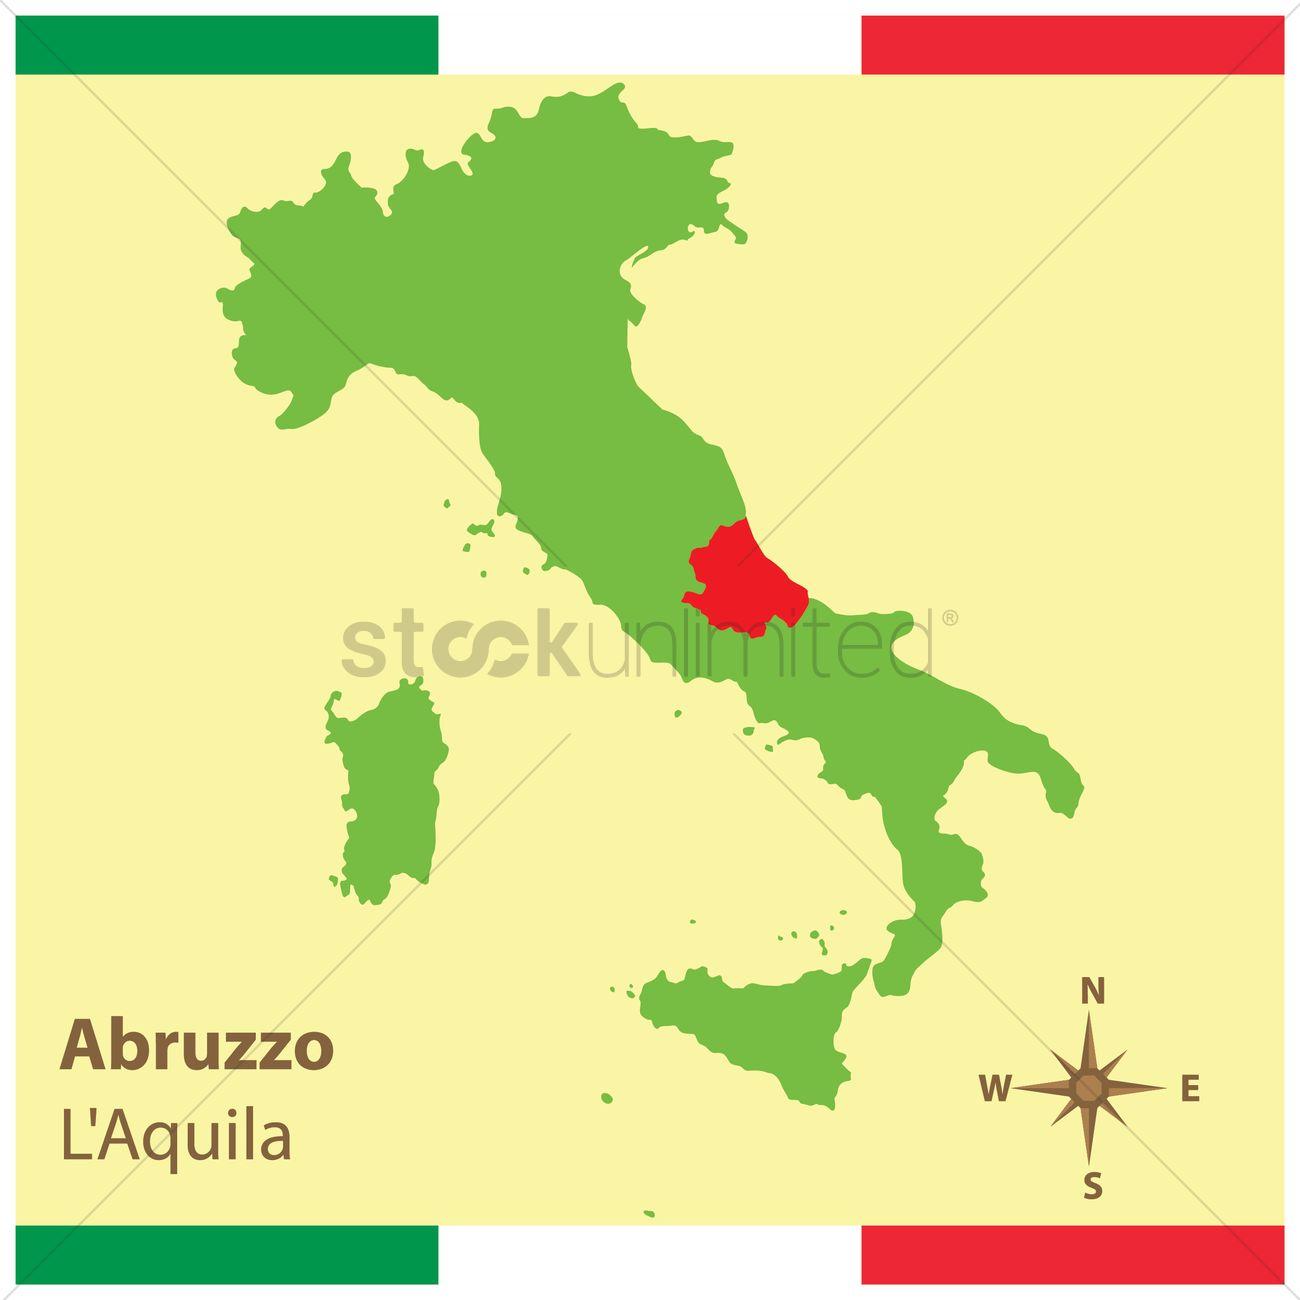 Aquila Italy Map.Abruzzo On Italy Map Vector Image 1583946 Stockunlimited